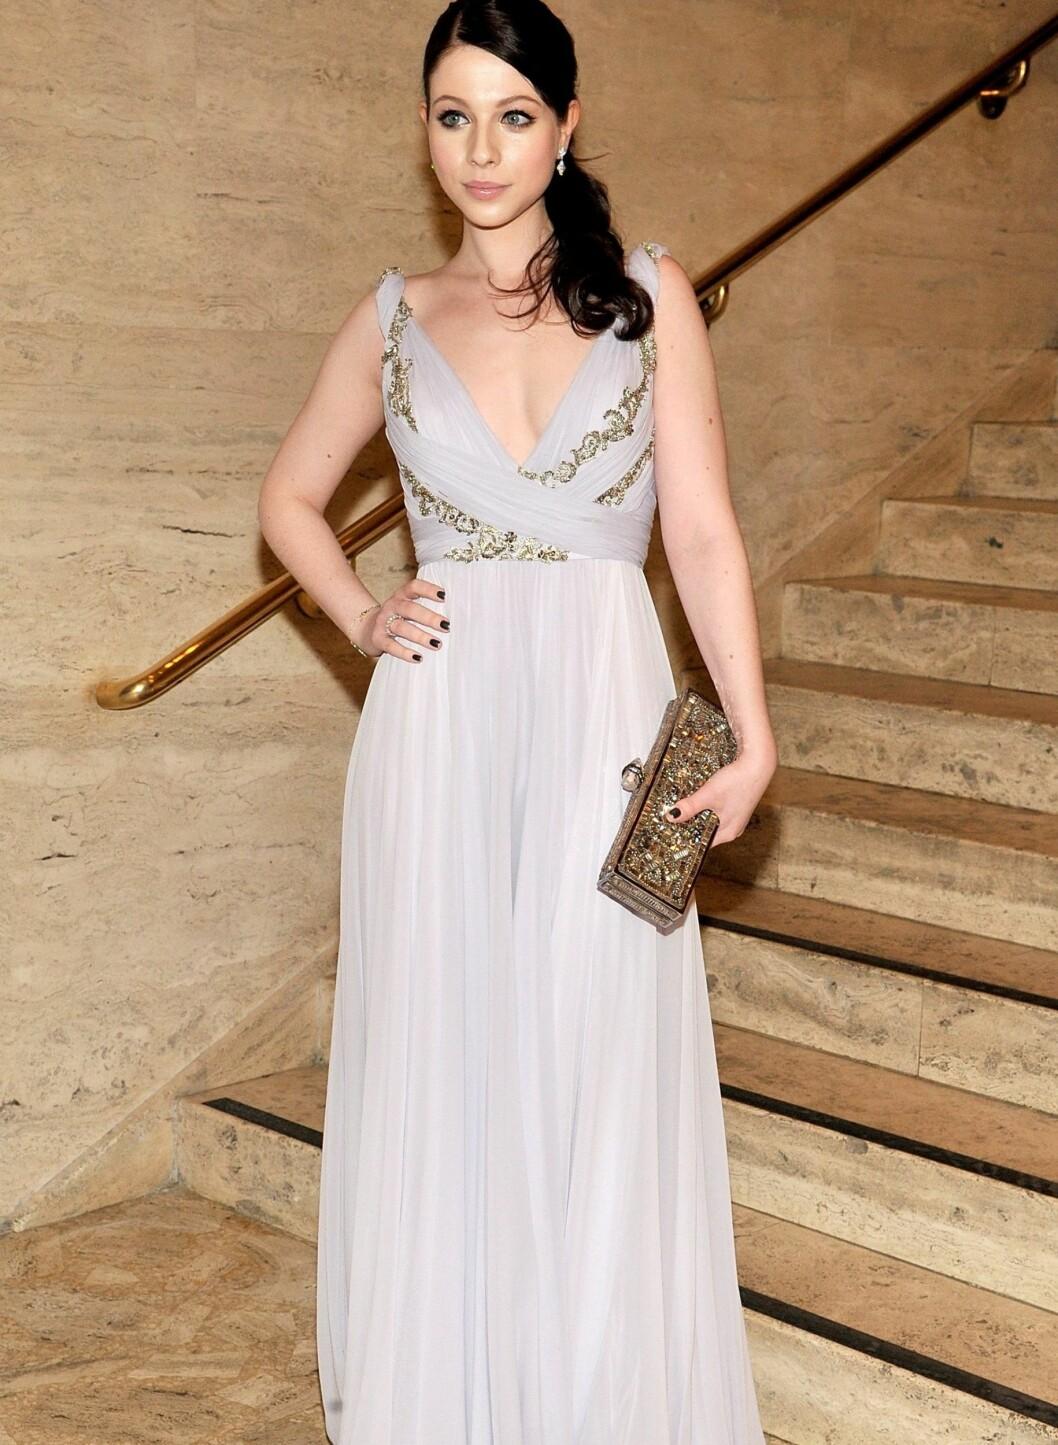 Michelle Trachtenberg på 2011 School of American Ballet Winter Ball i NYC. Foto: All Over Press